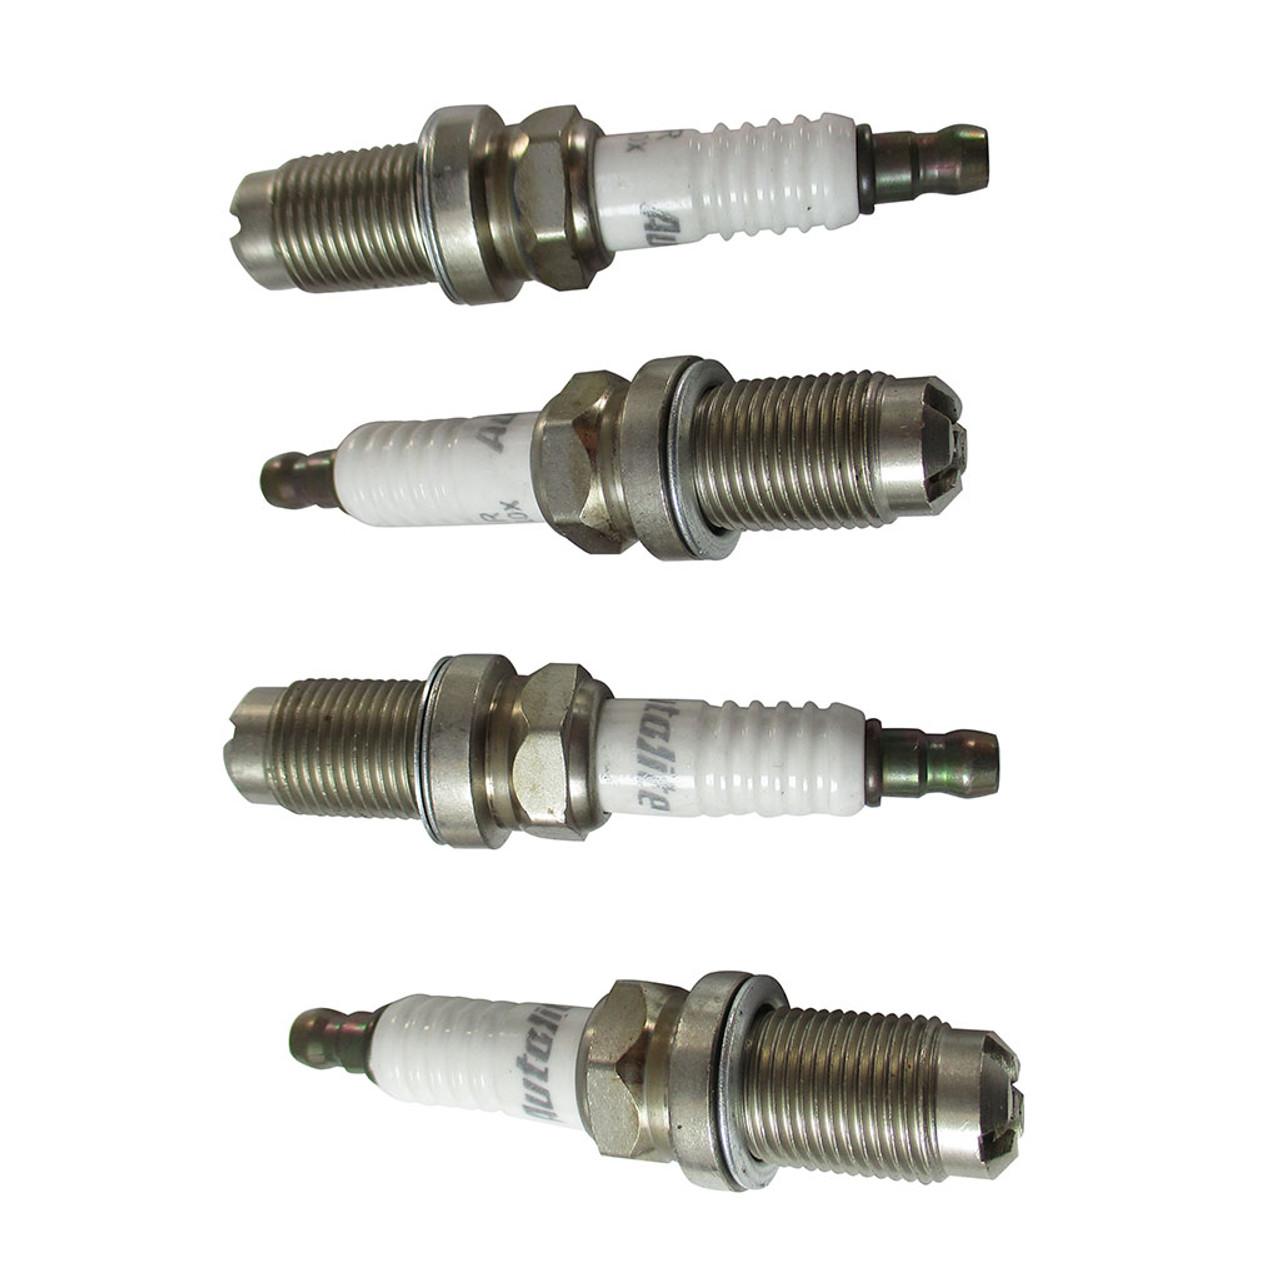 AR3910X Autolite Racing Spark Plugs Pack of 4